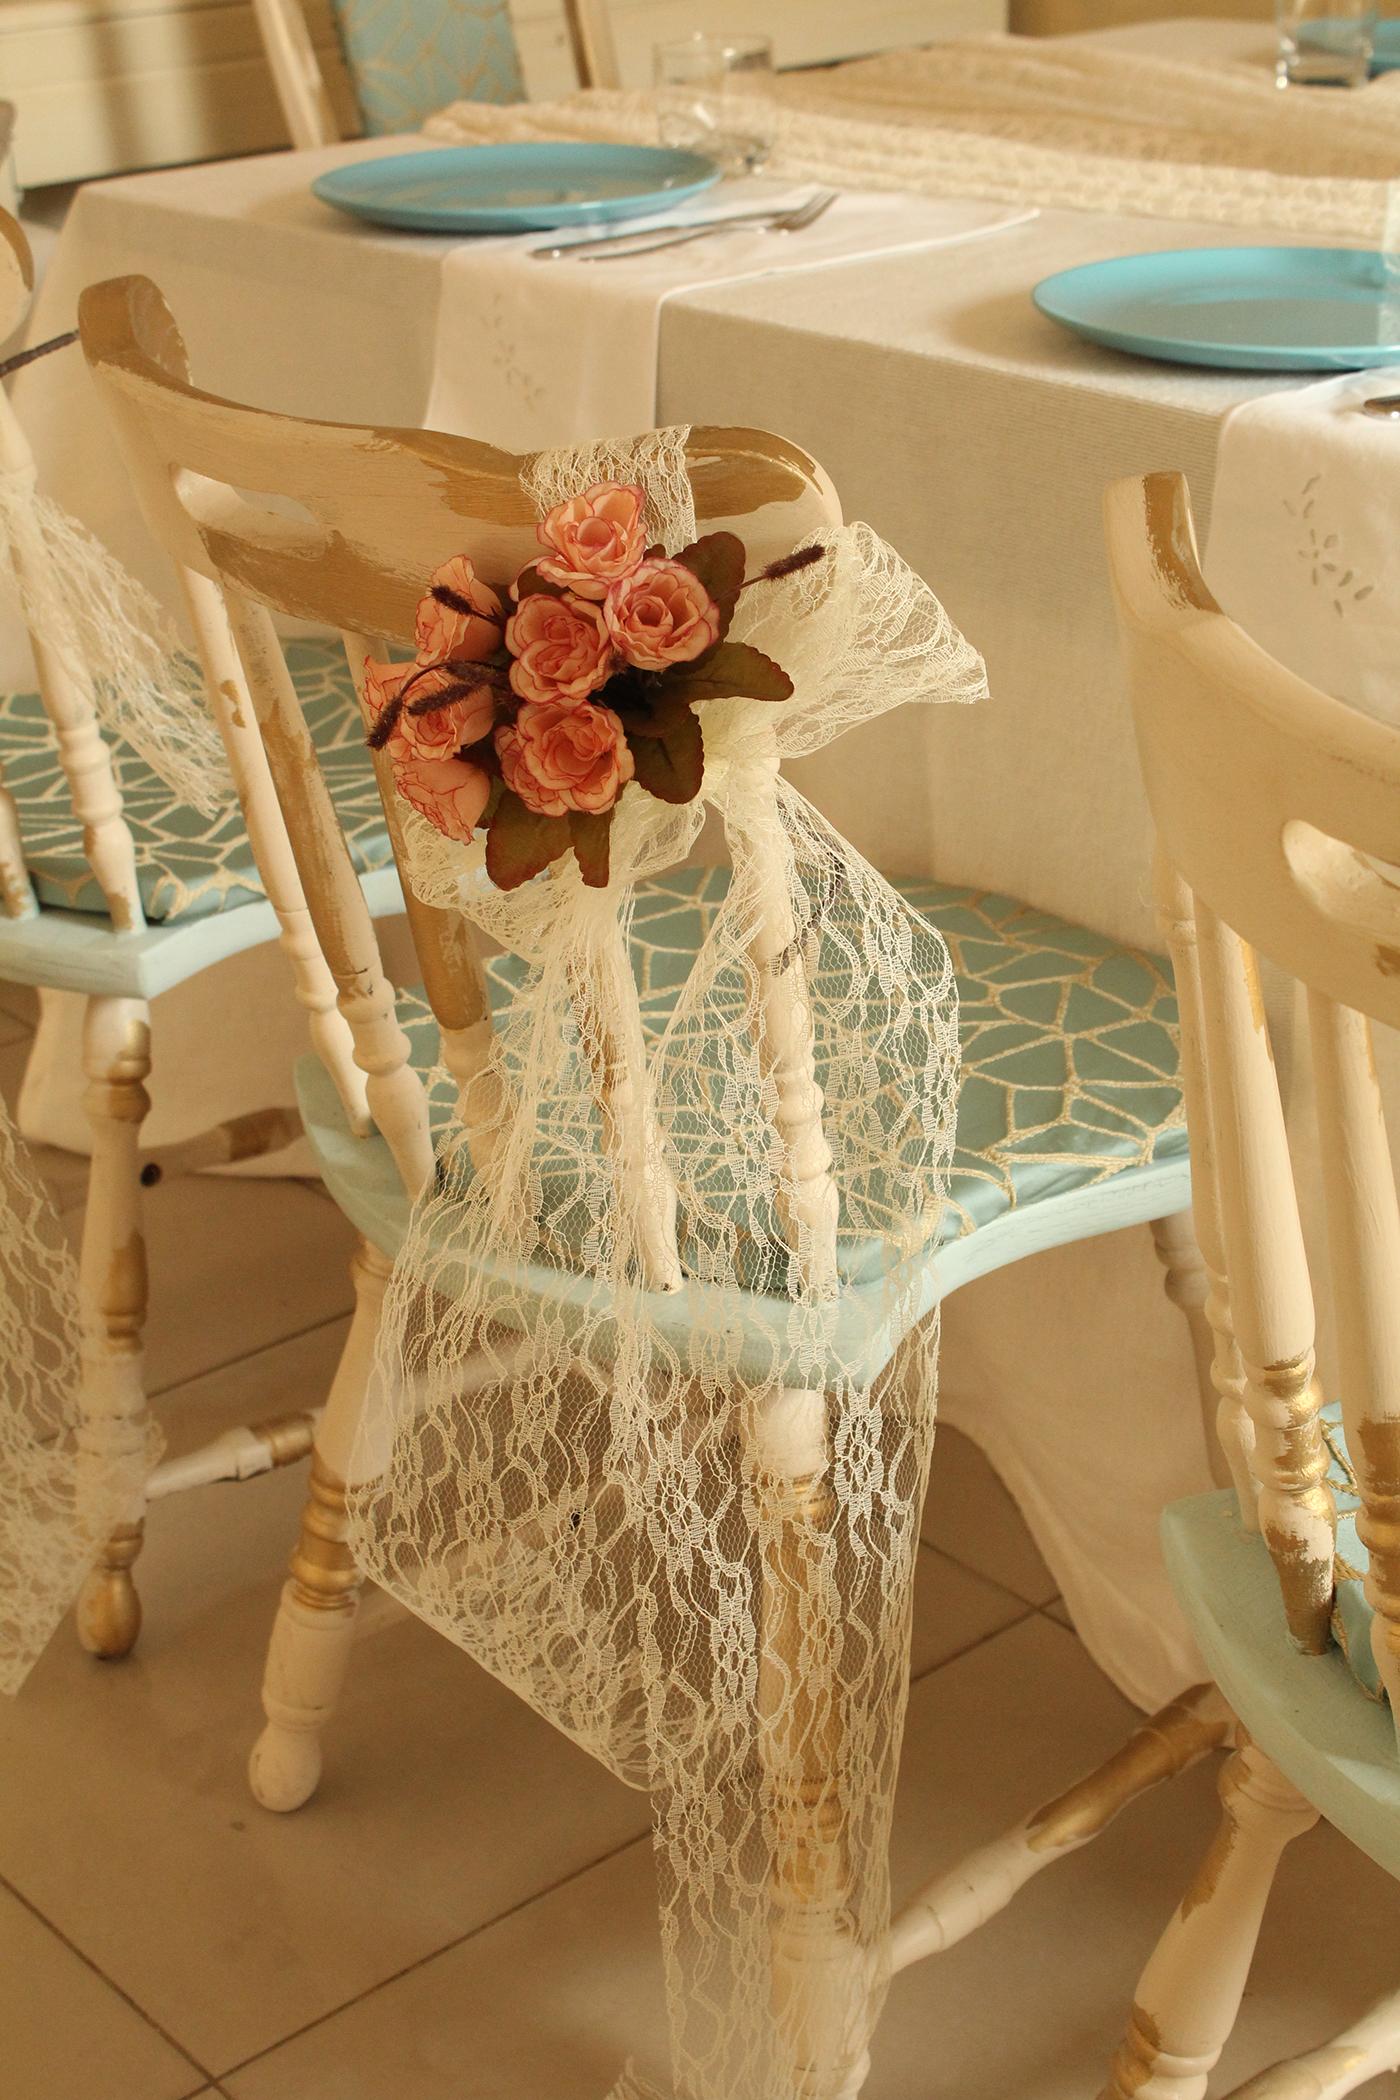 IMG 8138 - חידוש כסאות לפינת אוכל בסלון